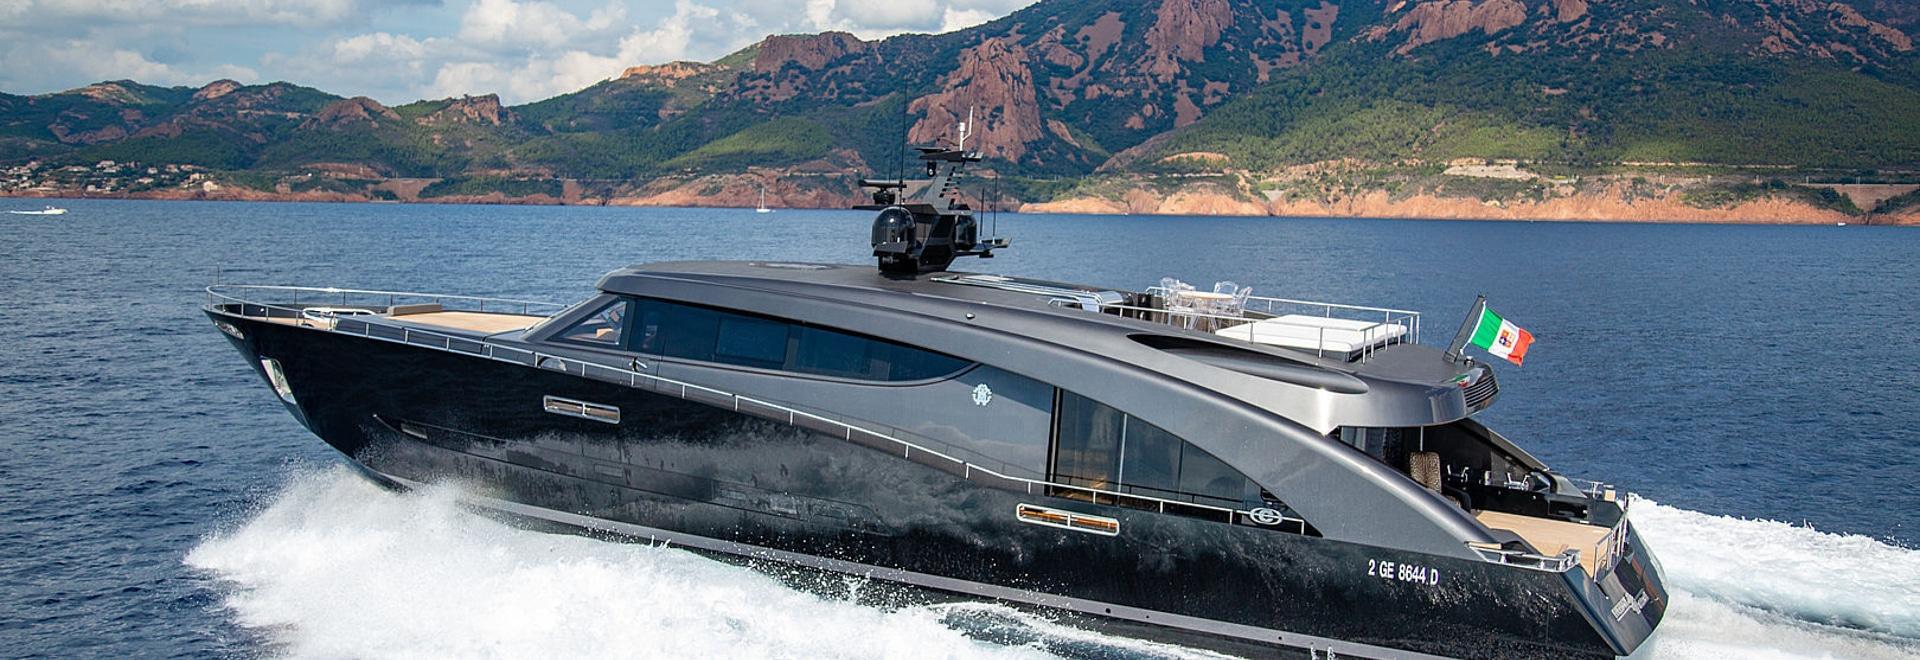 An Bord Roberto Cavallis 28m Yacht Freiheit